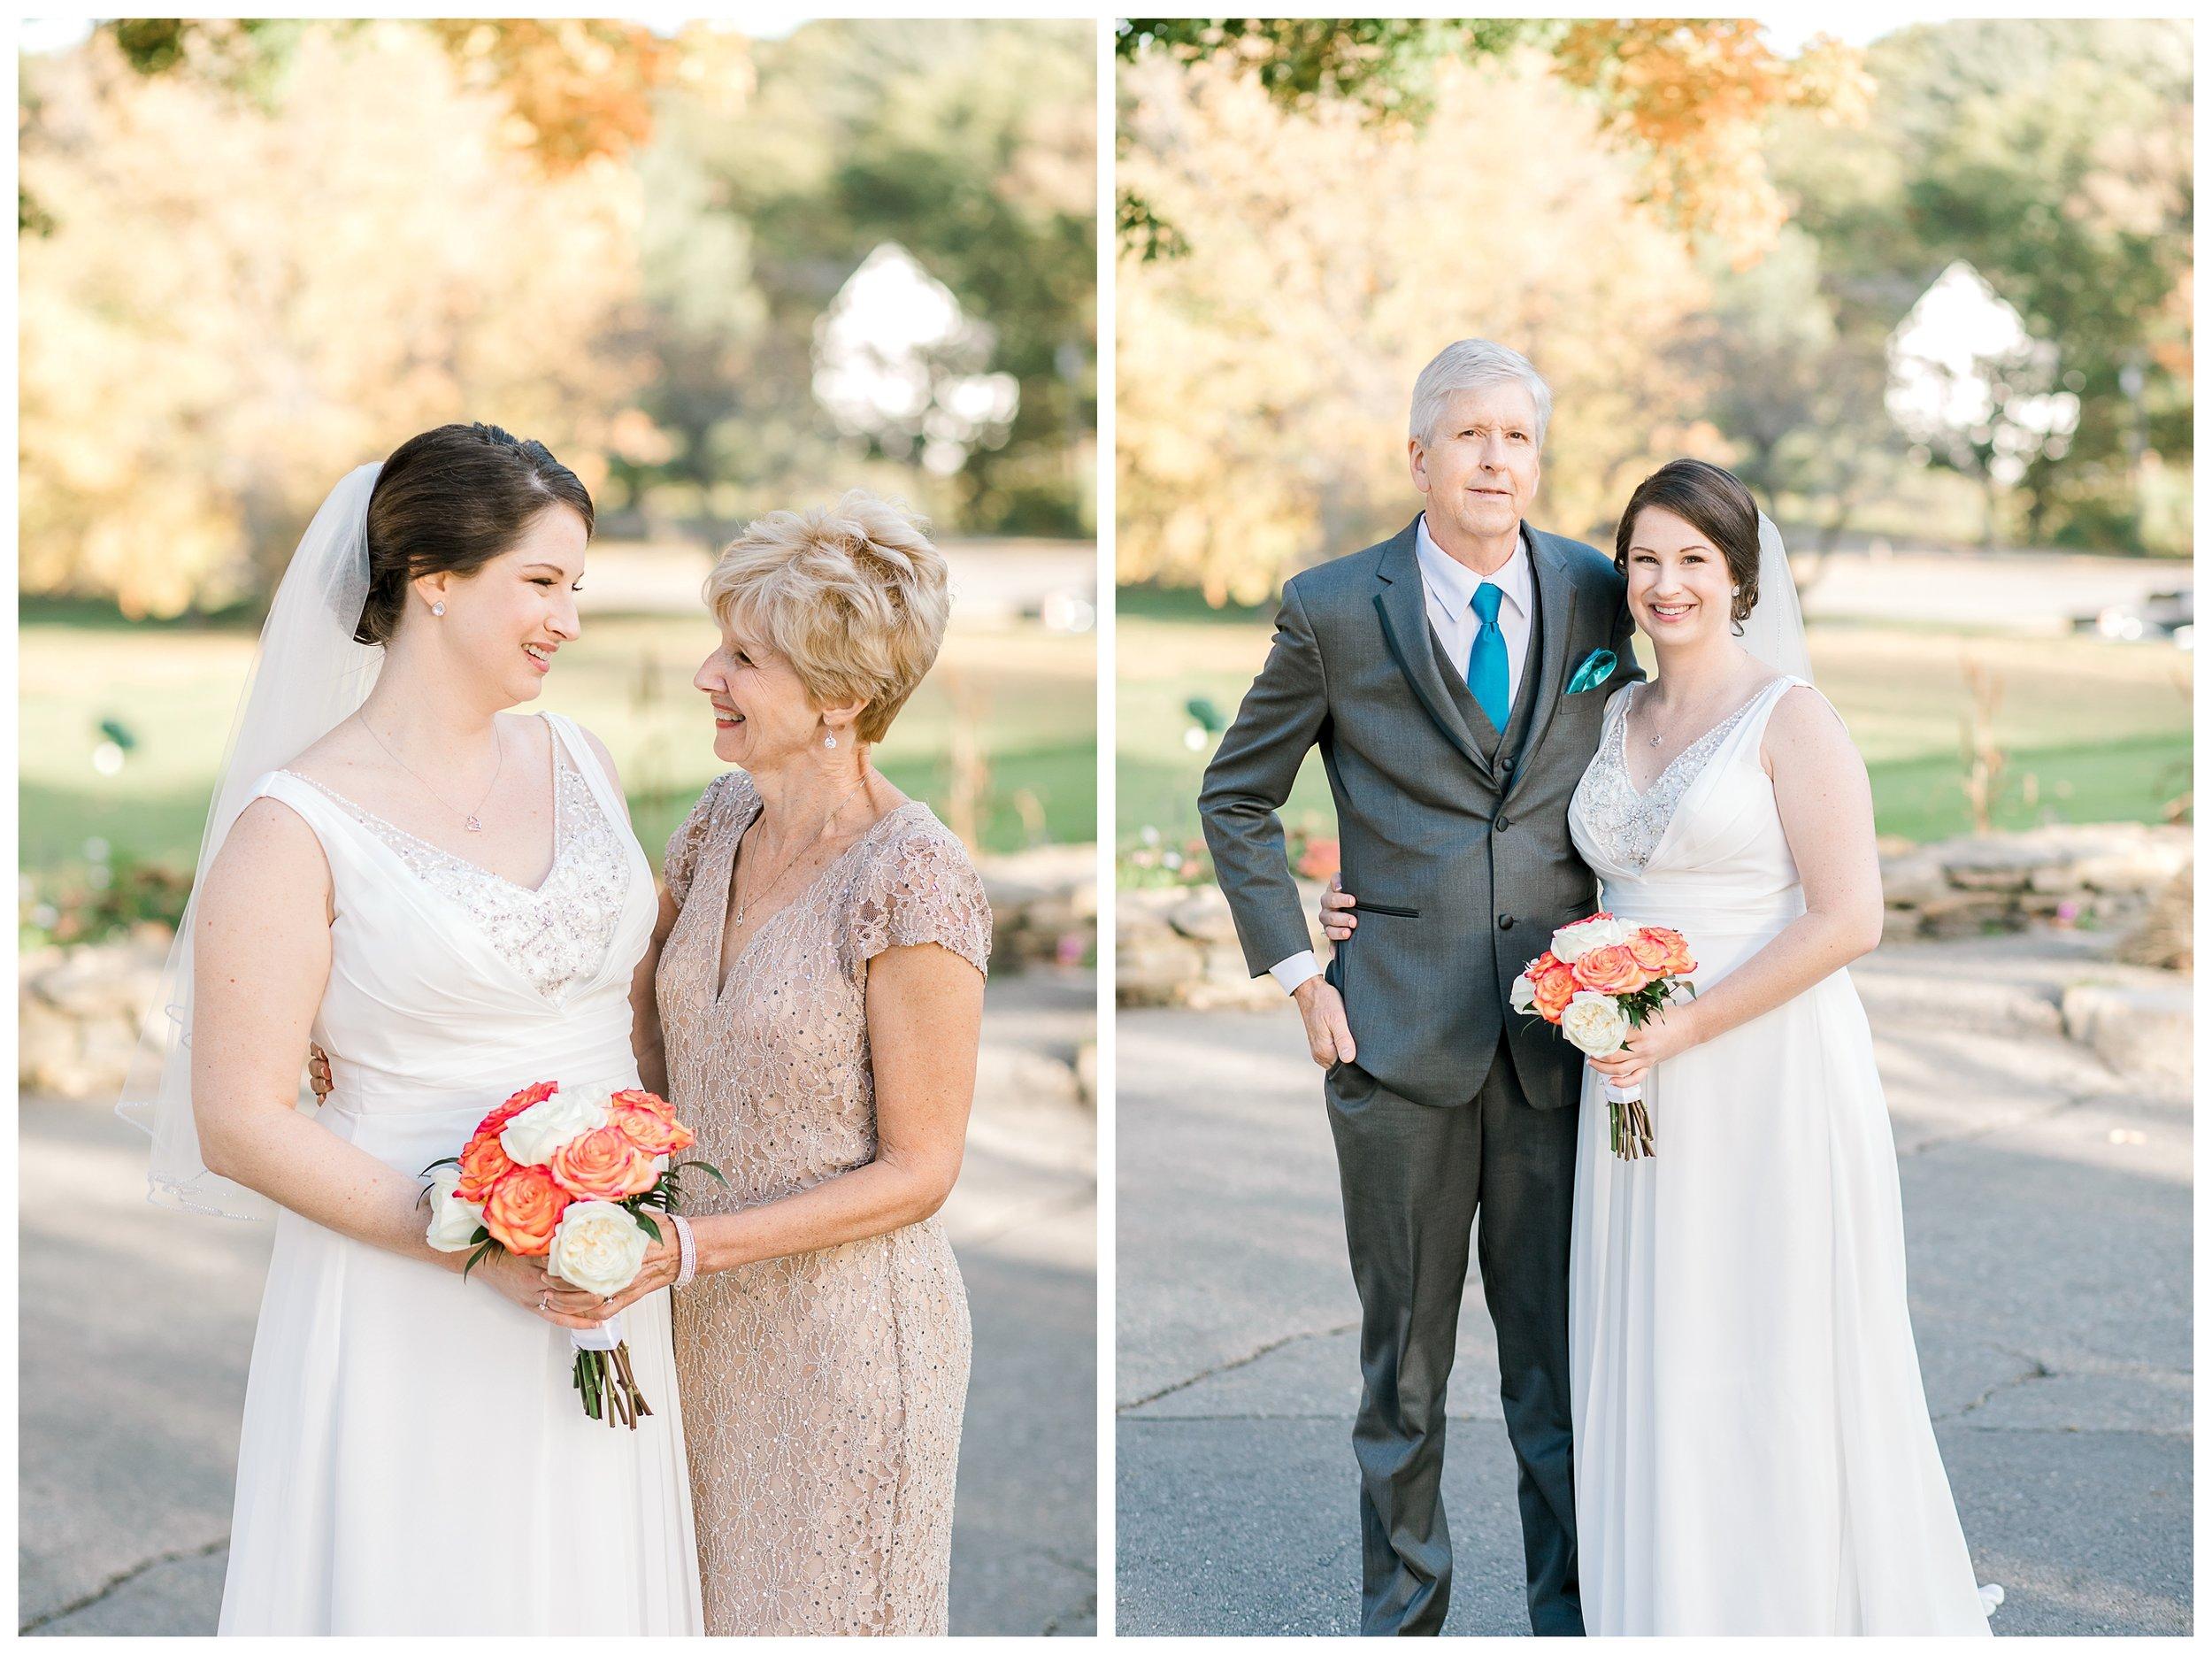 pleasant_valley_country_club_wedding_sutton_erica_pezente_photography (41).jpg